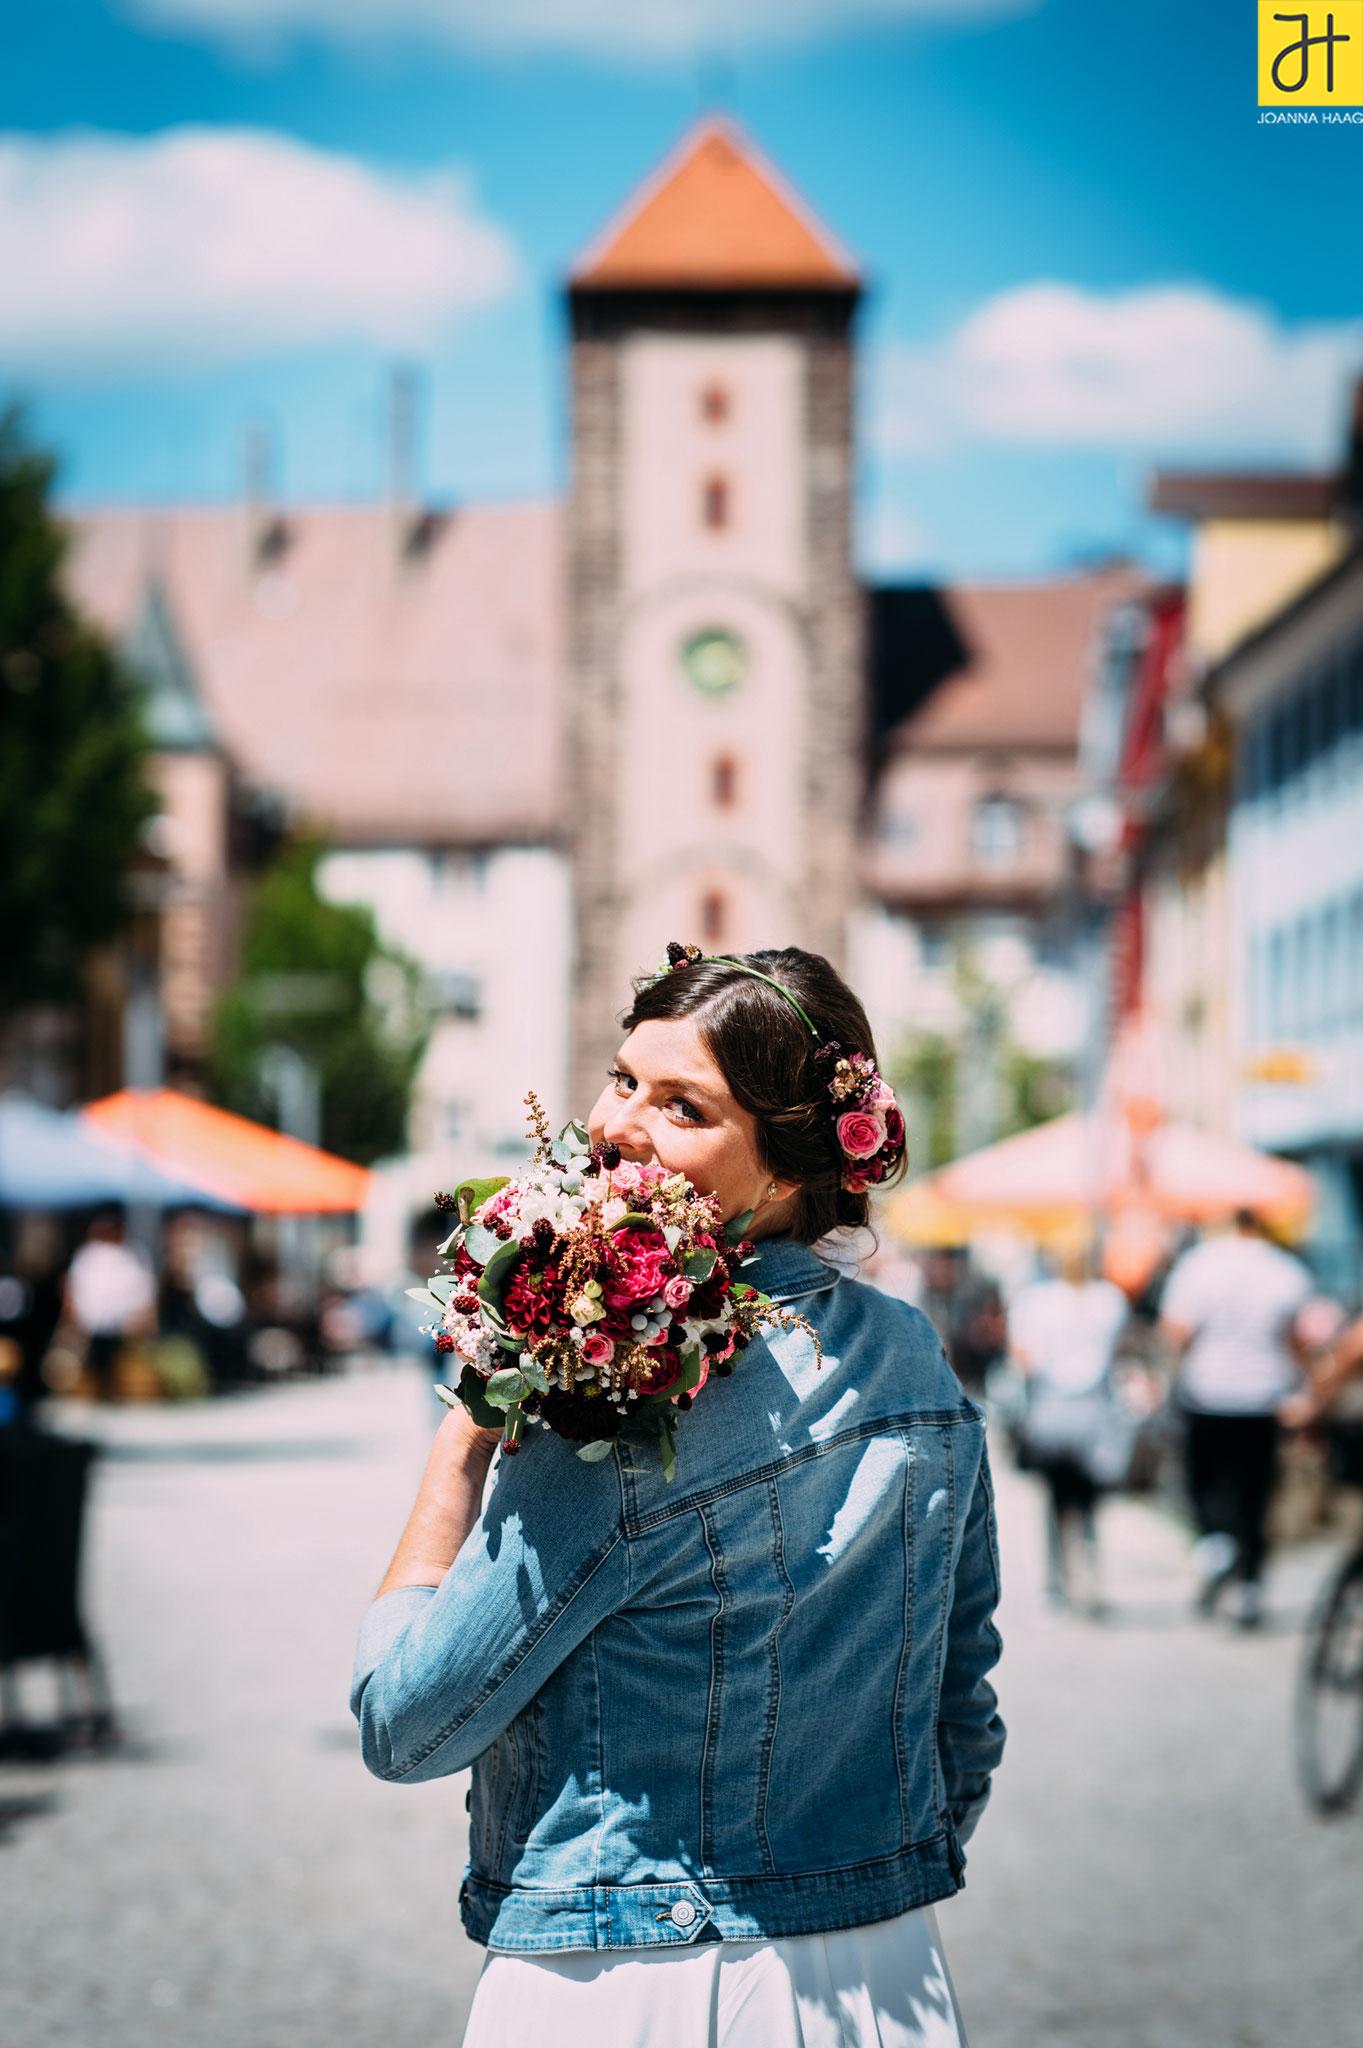 © JOANNA HAAG / #Hochzeit #Brautpaarshooting #Brautpaar #Villingen #OberesTor